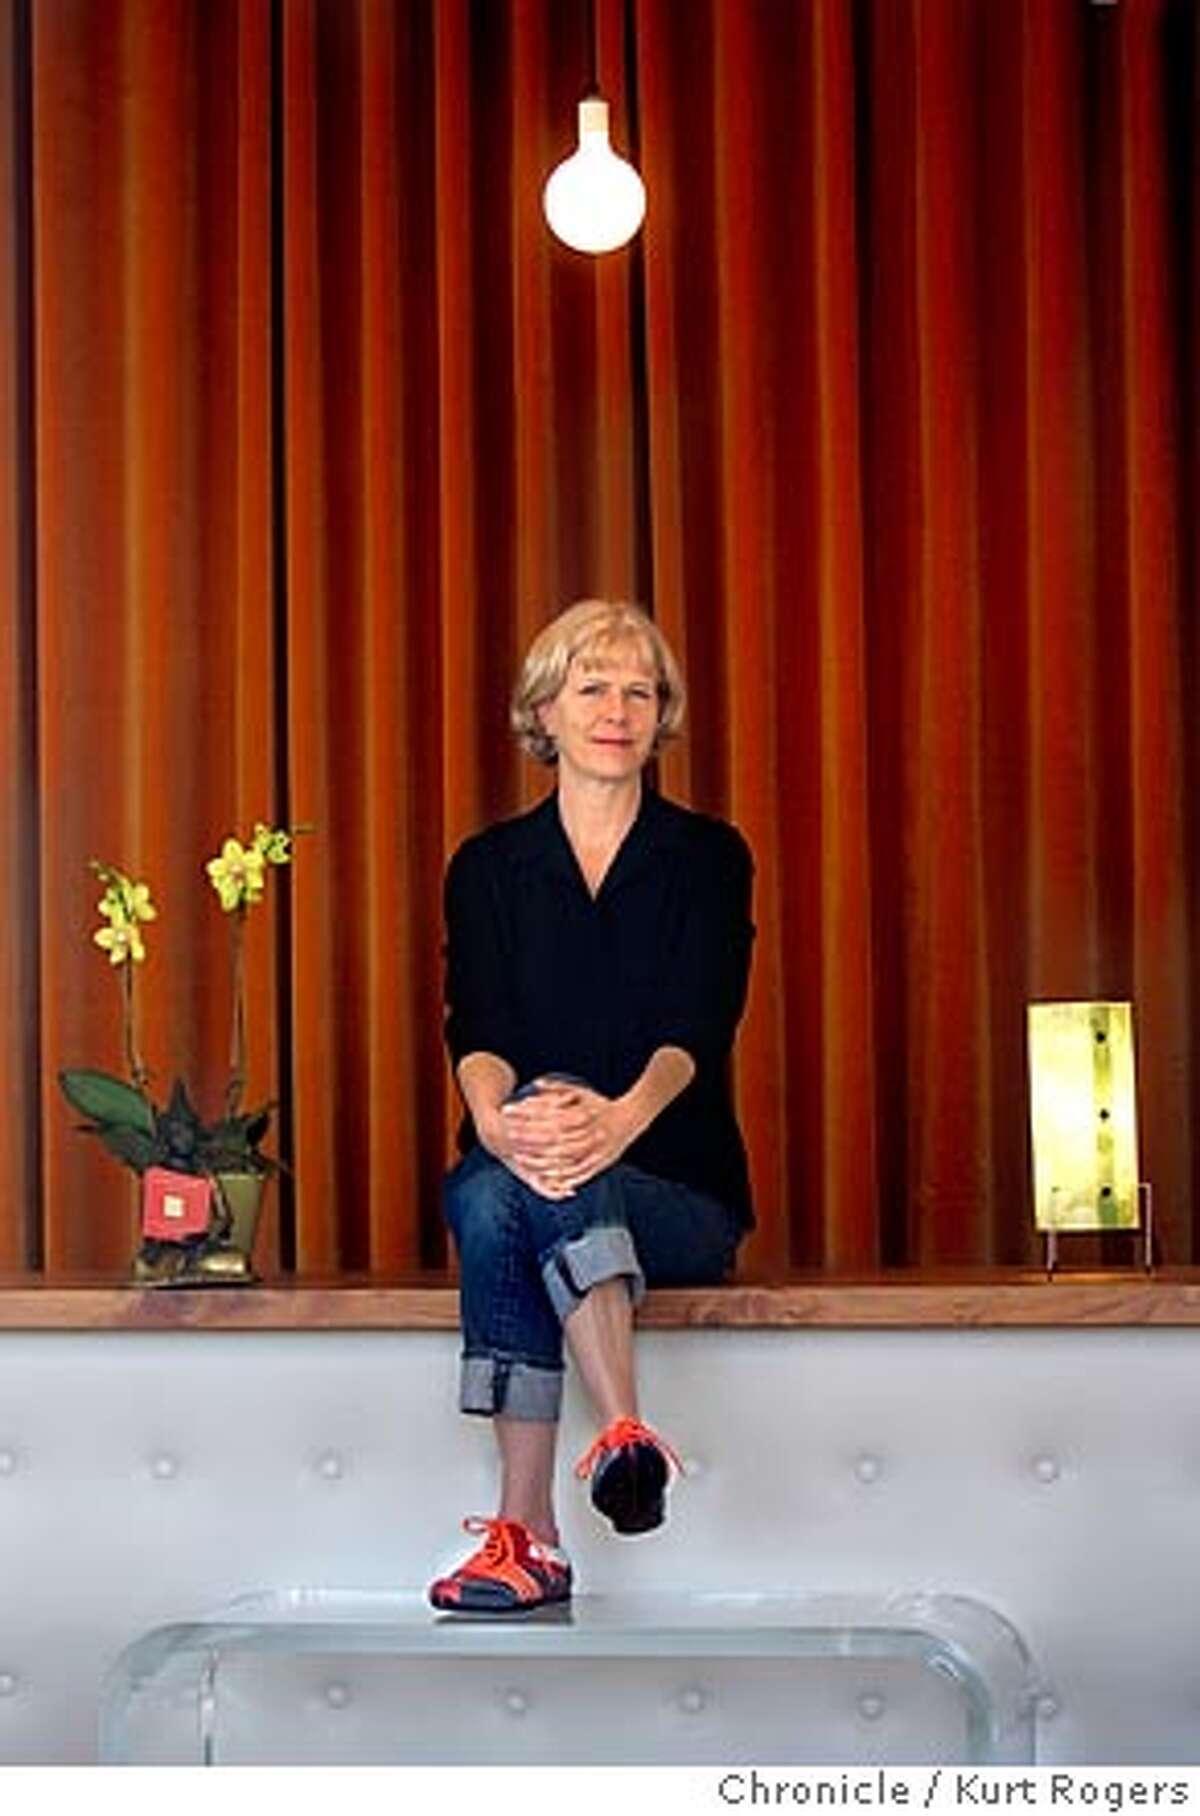 Interior designer Jean Flynn in her shop in Berkeley on San Pablo Ave . 3/15/05 in Berkeley,CA. KURT ROGERS/THE CHRONICLE